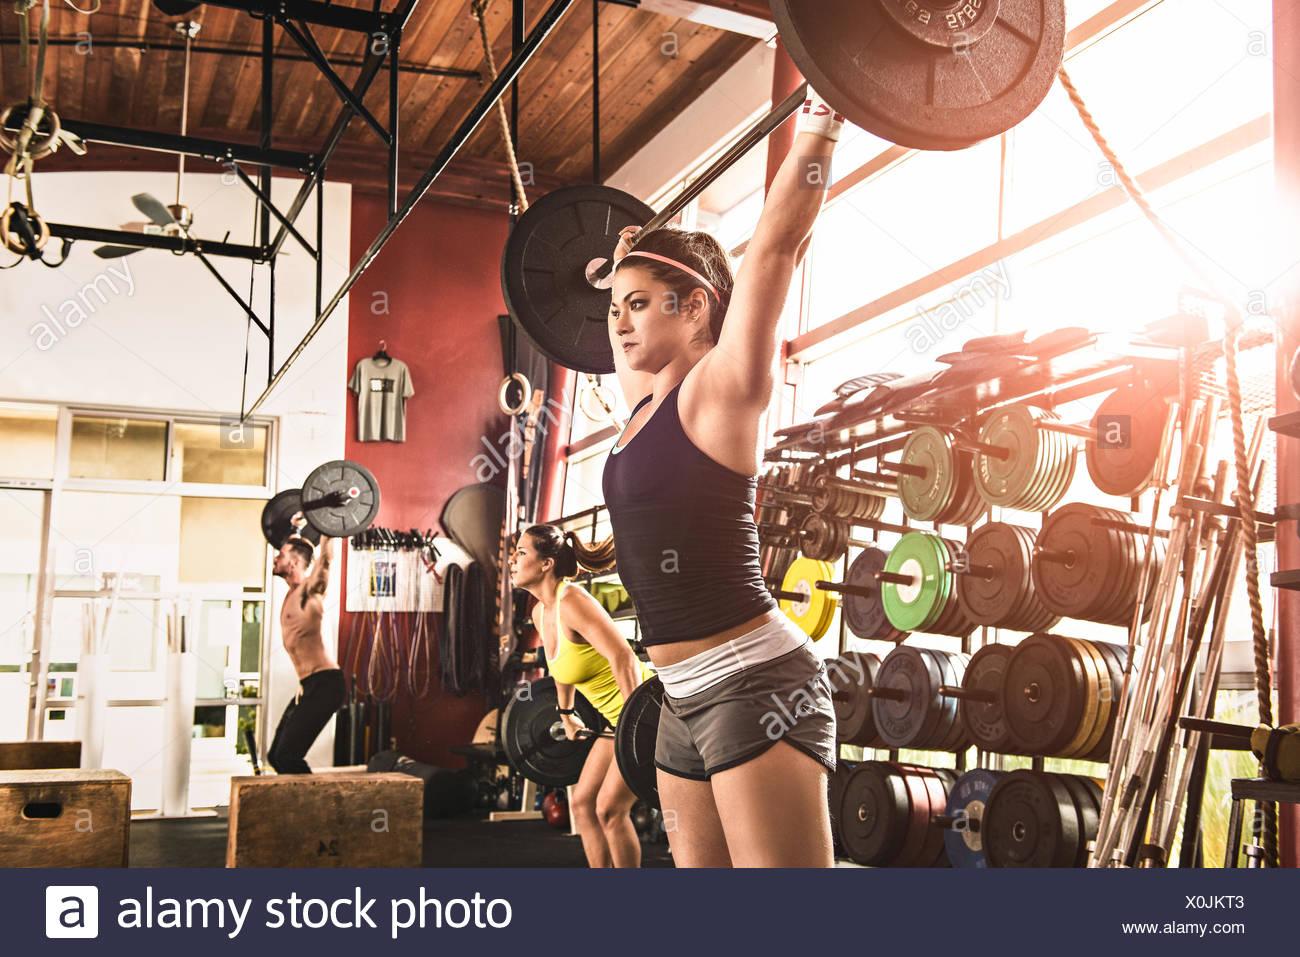 Bodybuilder, die Hantel heben, im Fitness-Studio Stockbild